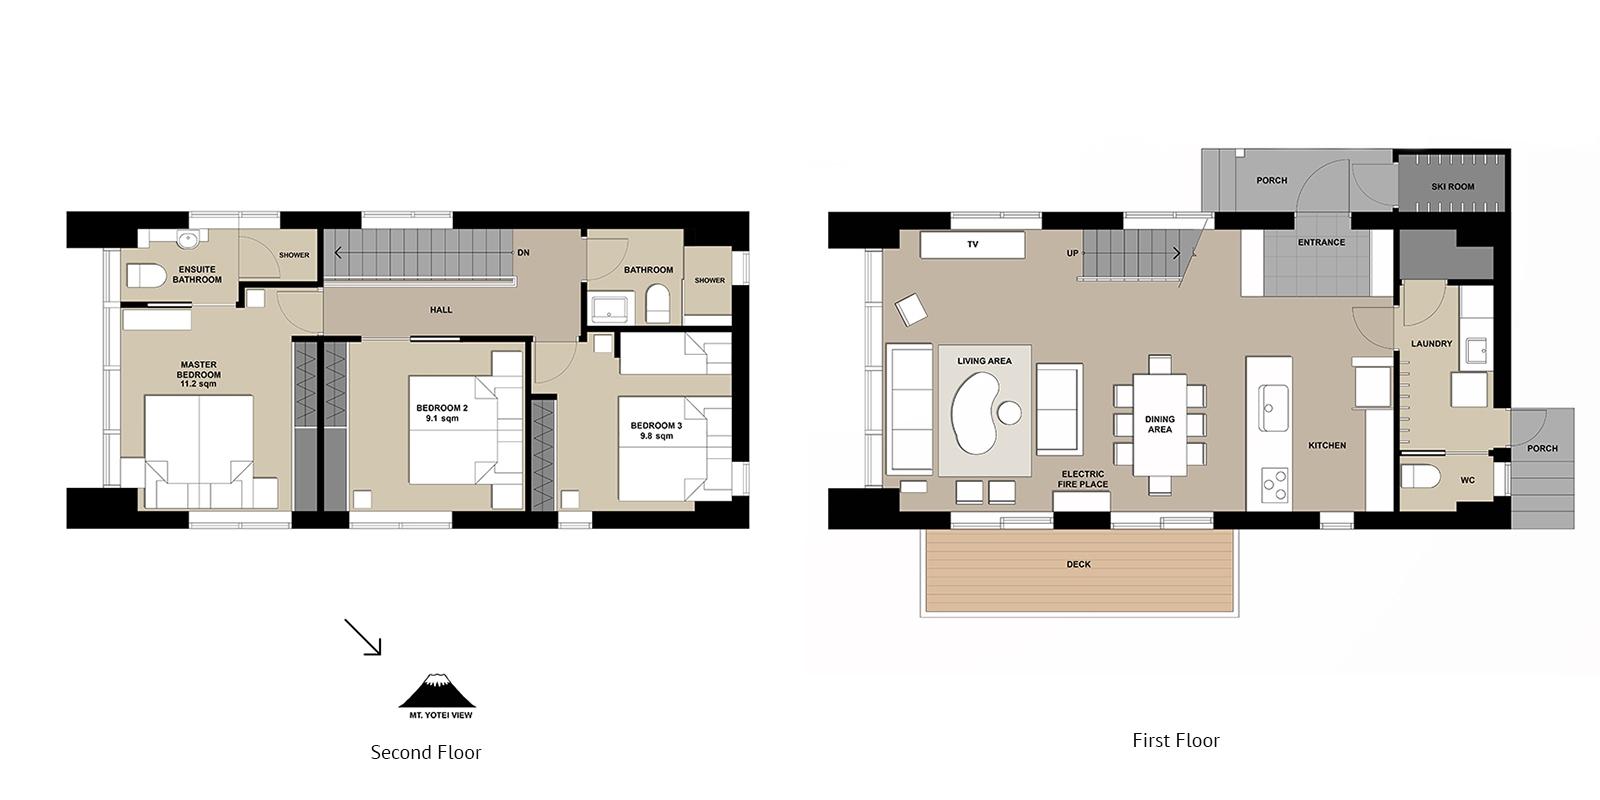 Yuki Uchi Floor Plan | HIrafu, Niseko | Miinistry of Chalets